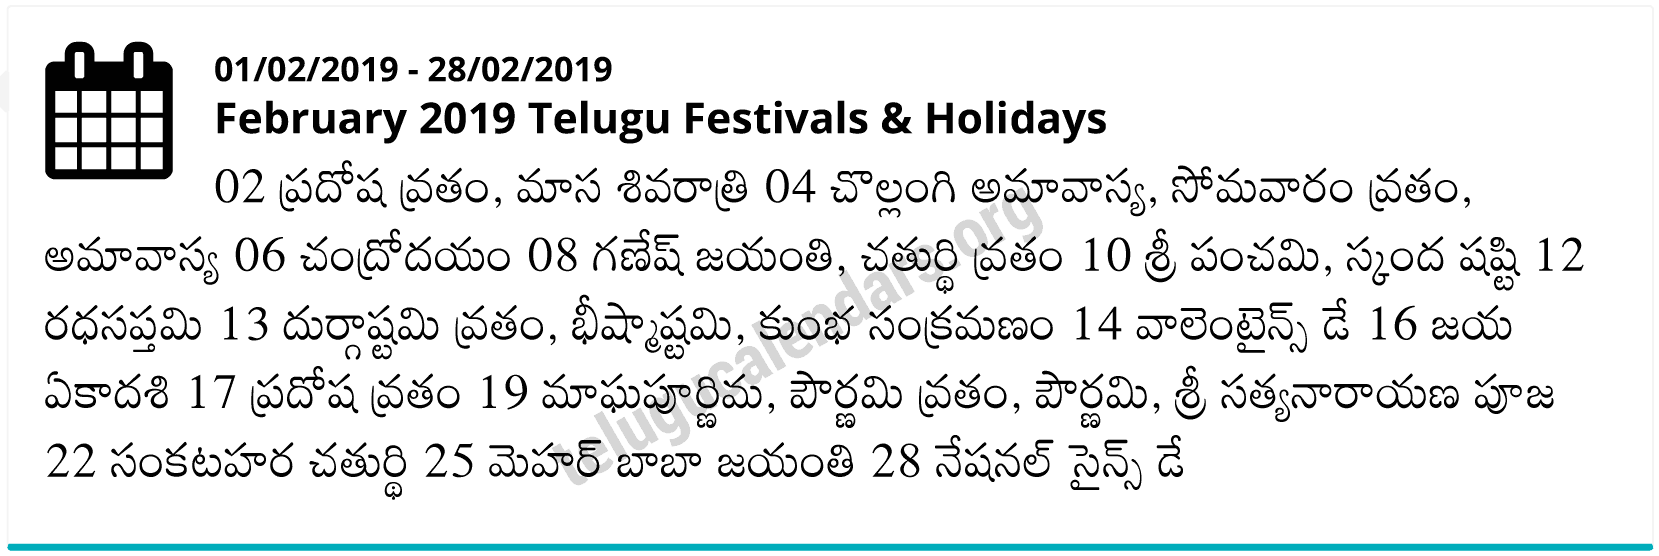 Telangana Telugu Calendars 2019 February Festivals Pdf